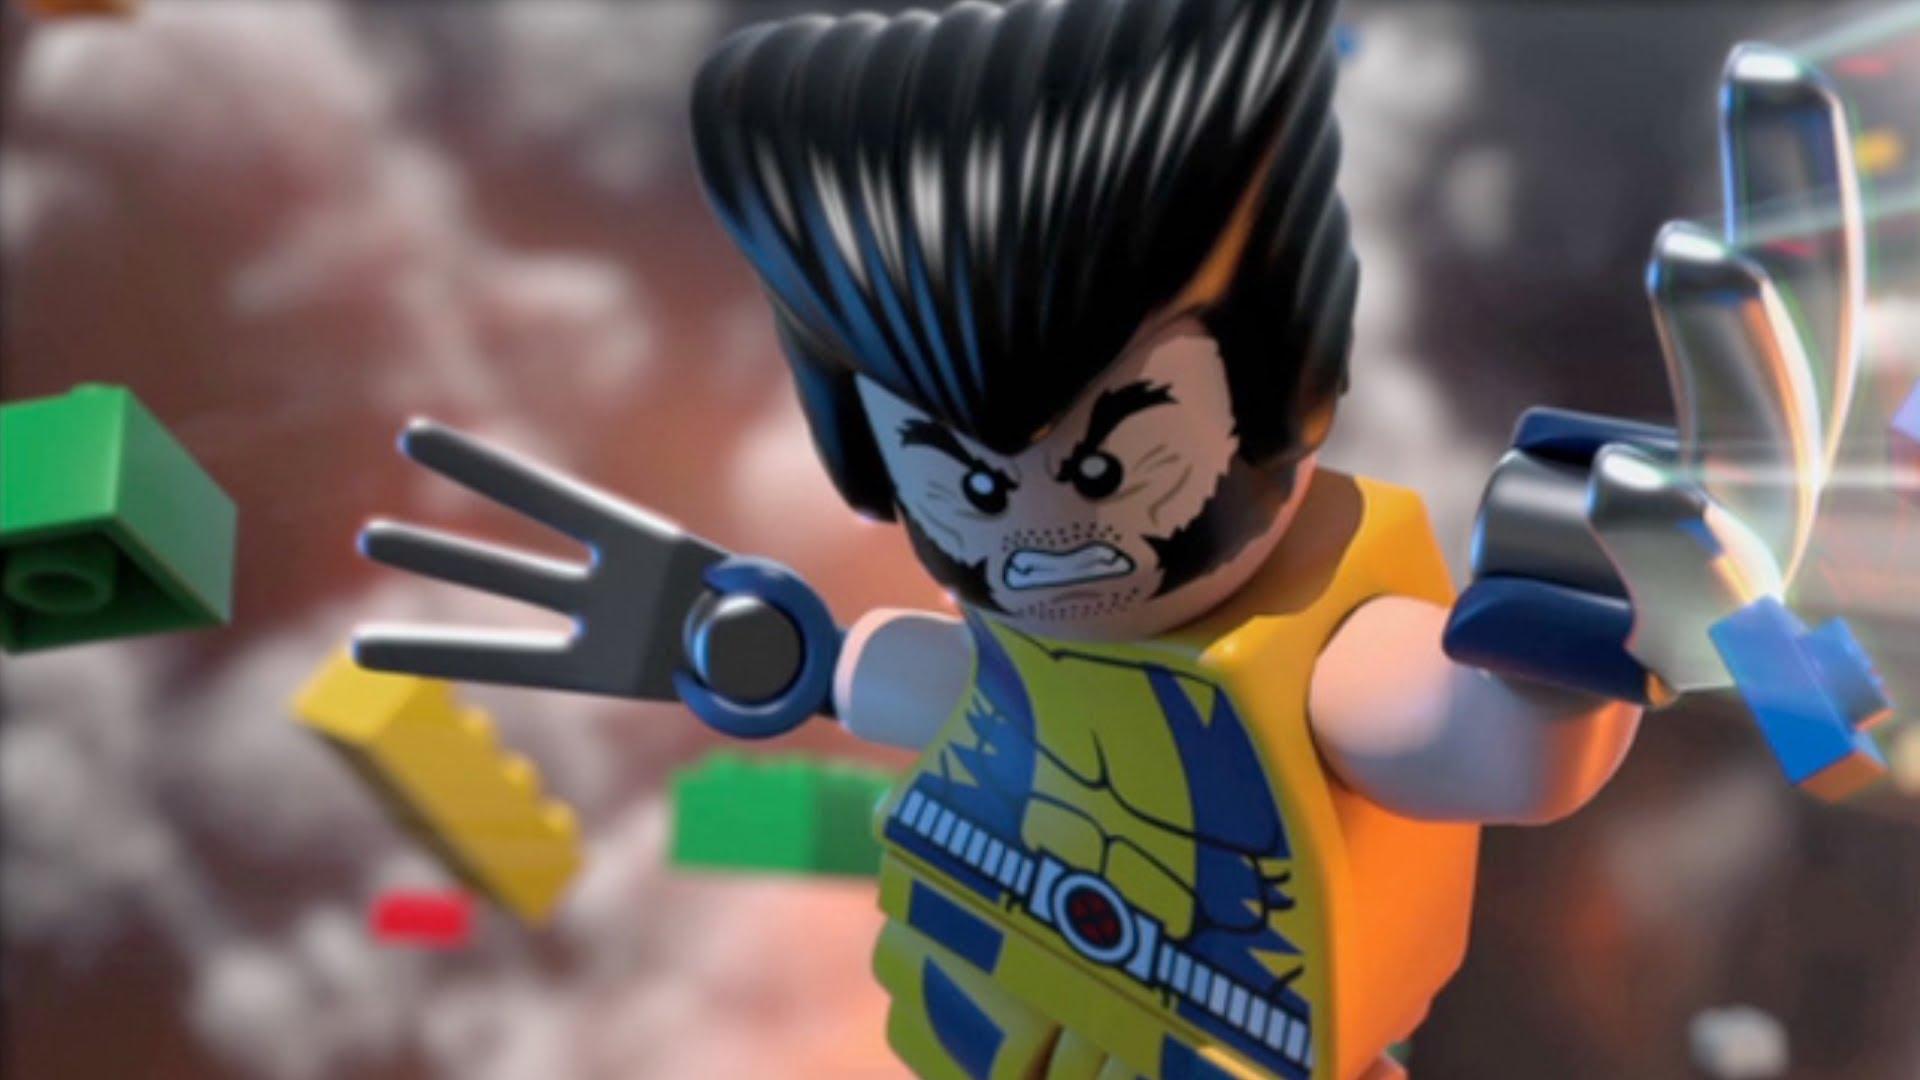 Lego marvel super heroes wallpaper 3 voltagebd Image collections